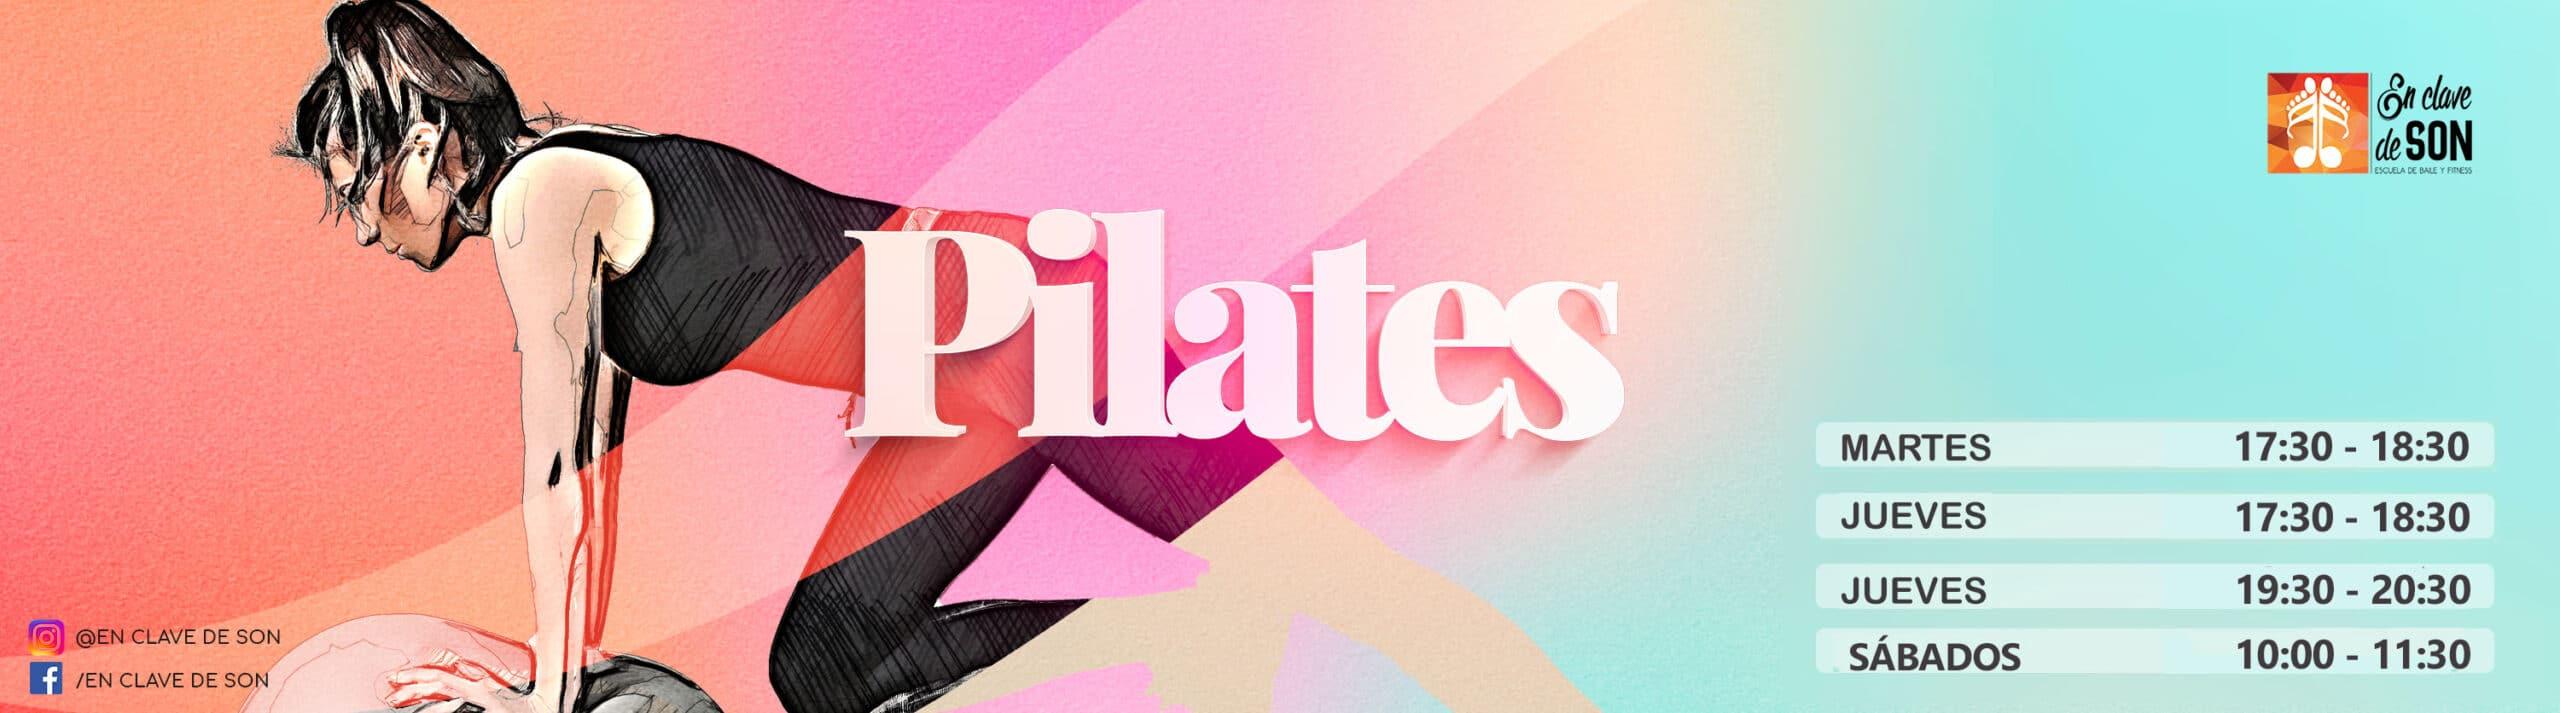 Pilates Pamplona